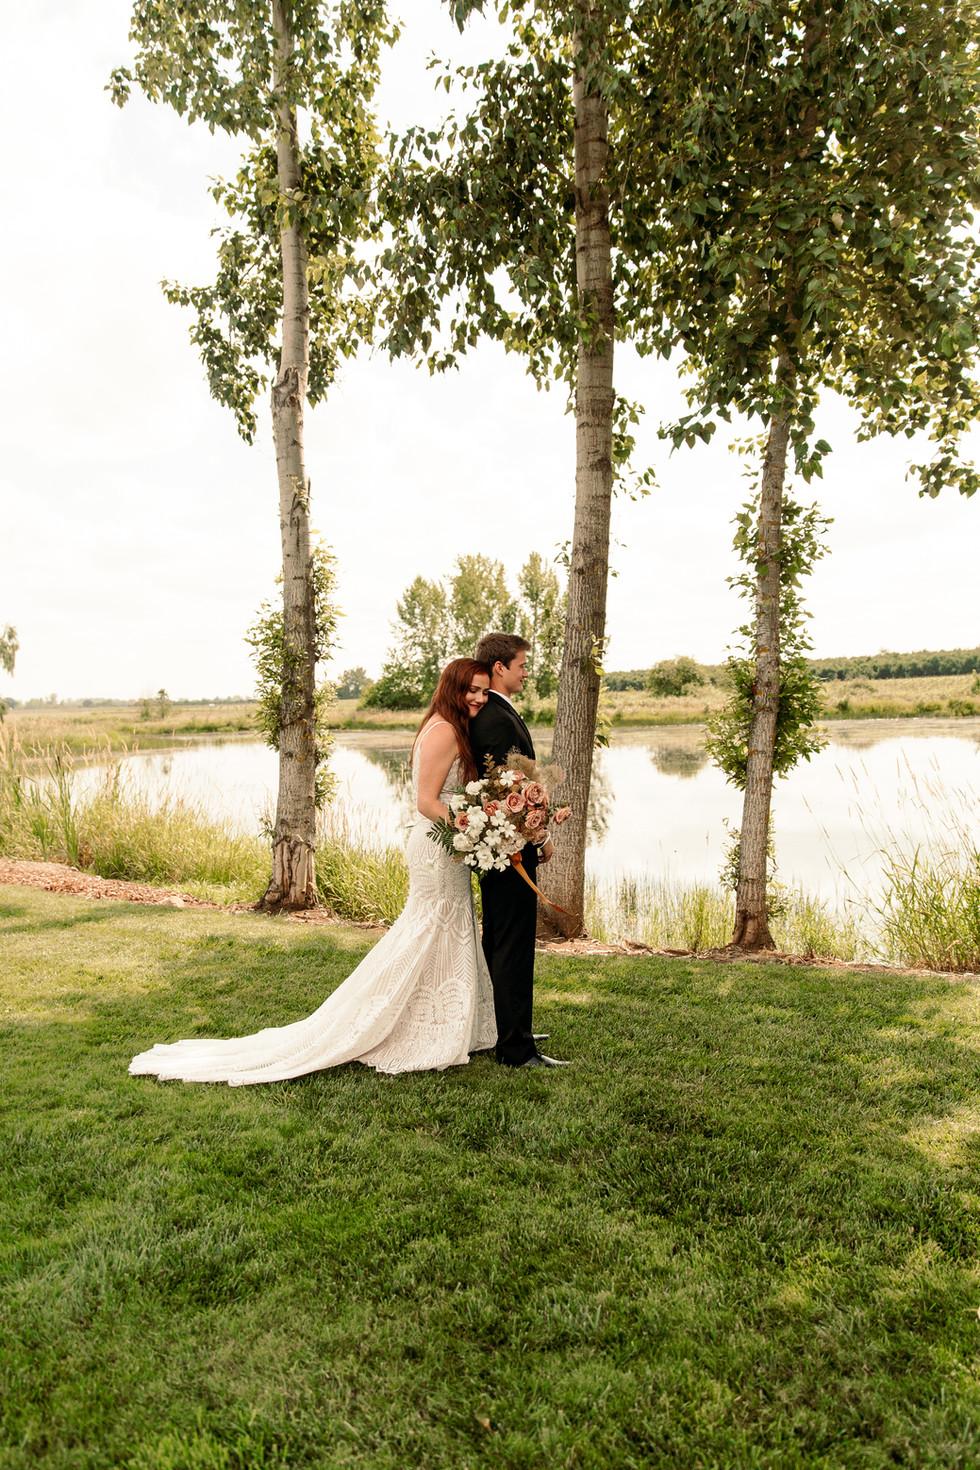 EMILY VANDEHEY PHOTOGRAPHY -- Oregon Wed